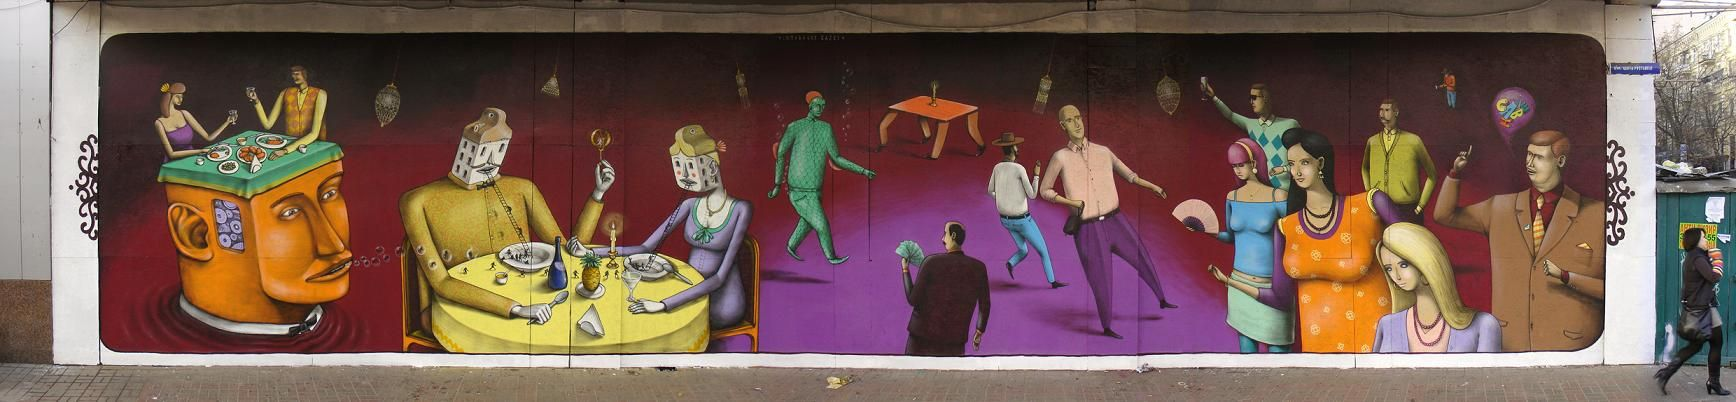 Artwork By AEC, Waone in Kyiv, Kiev